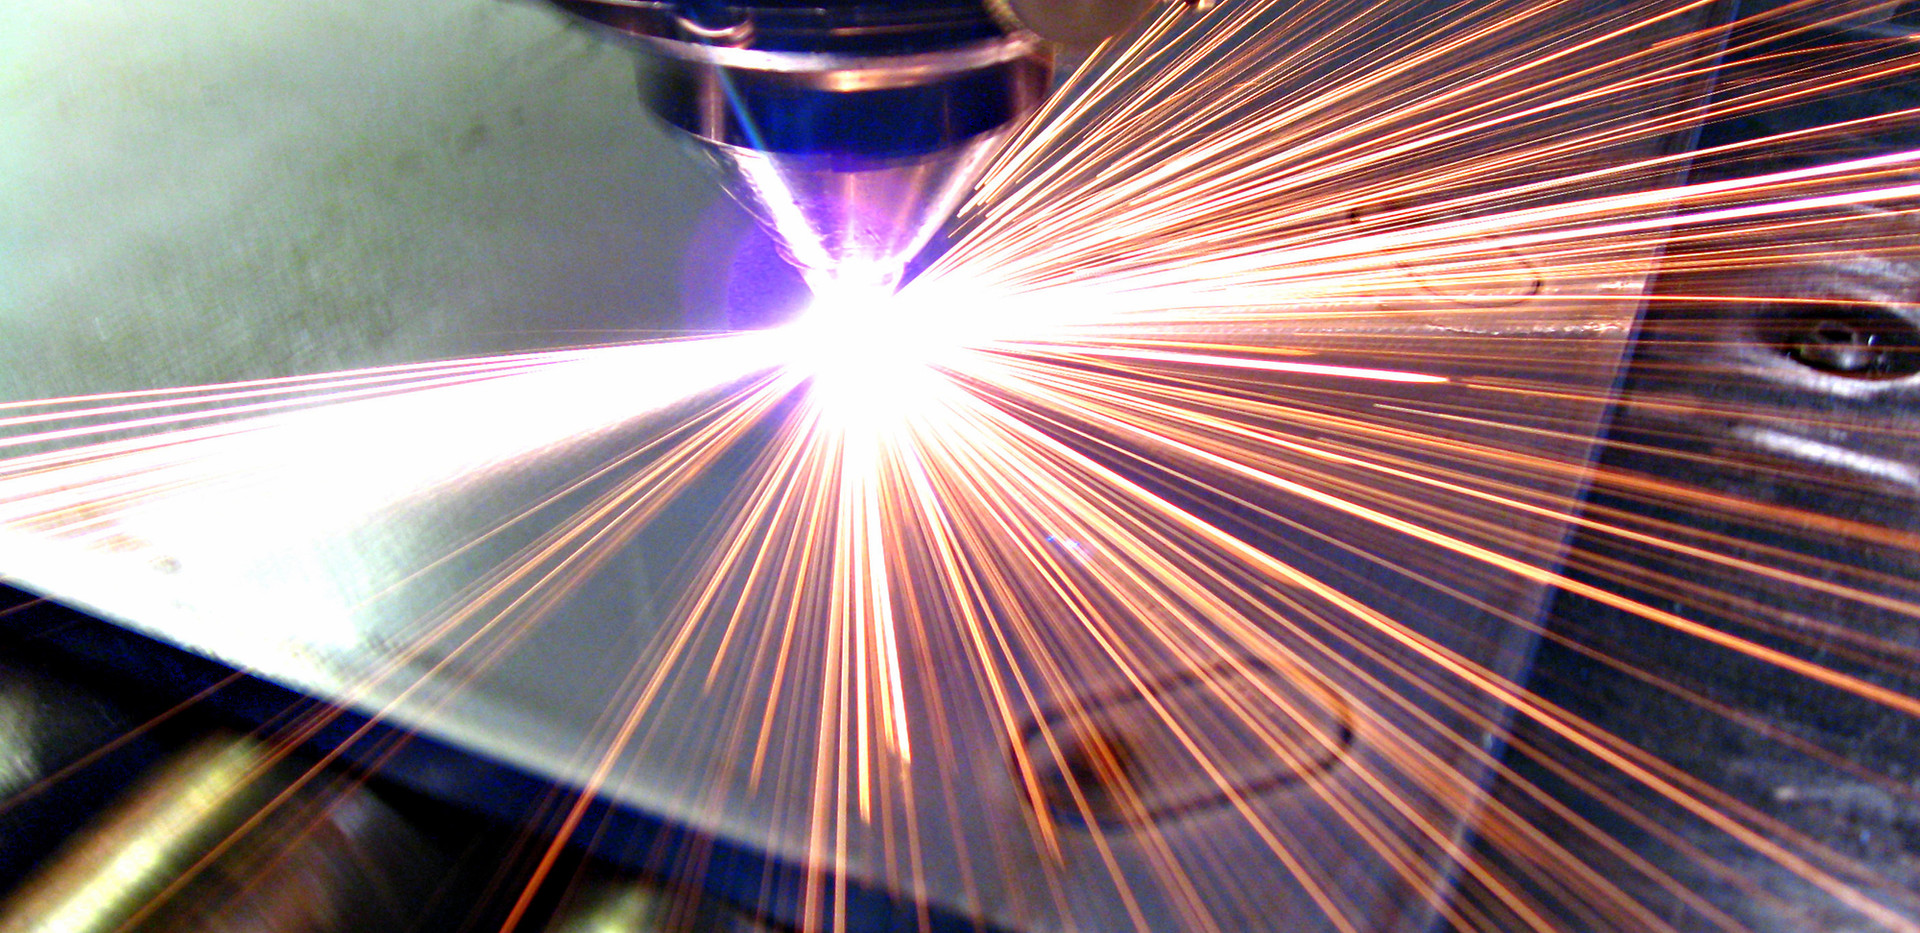 Materials - Sheet Metal - Machining - Composites